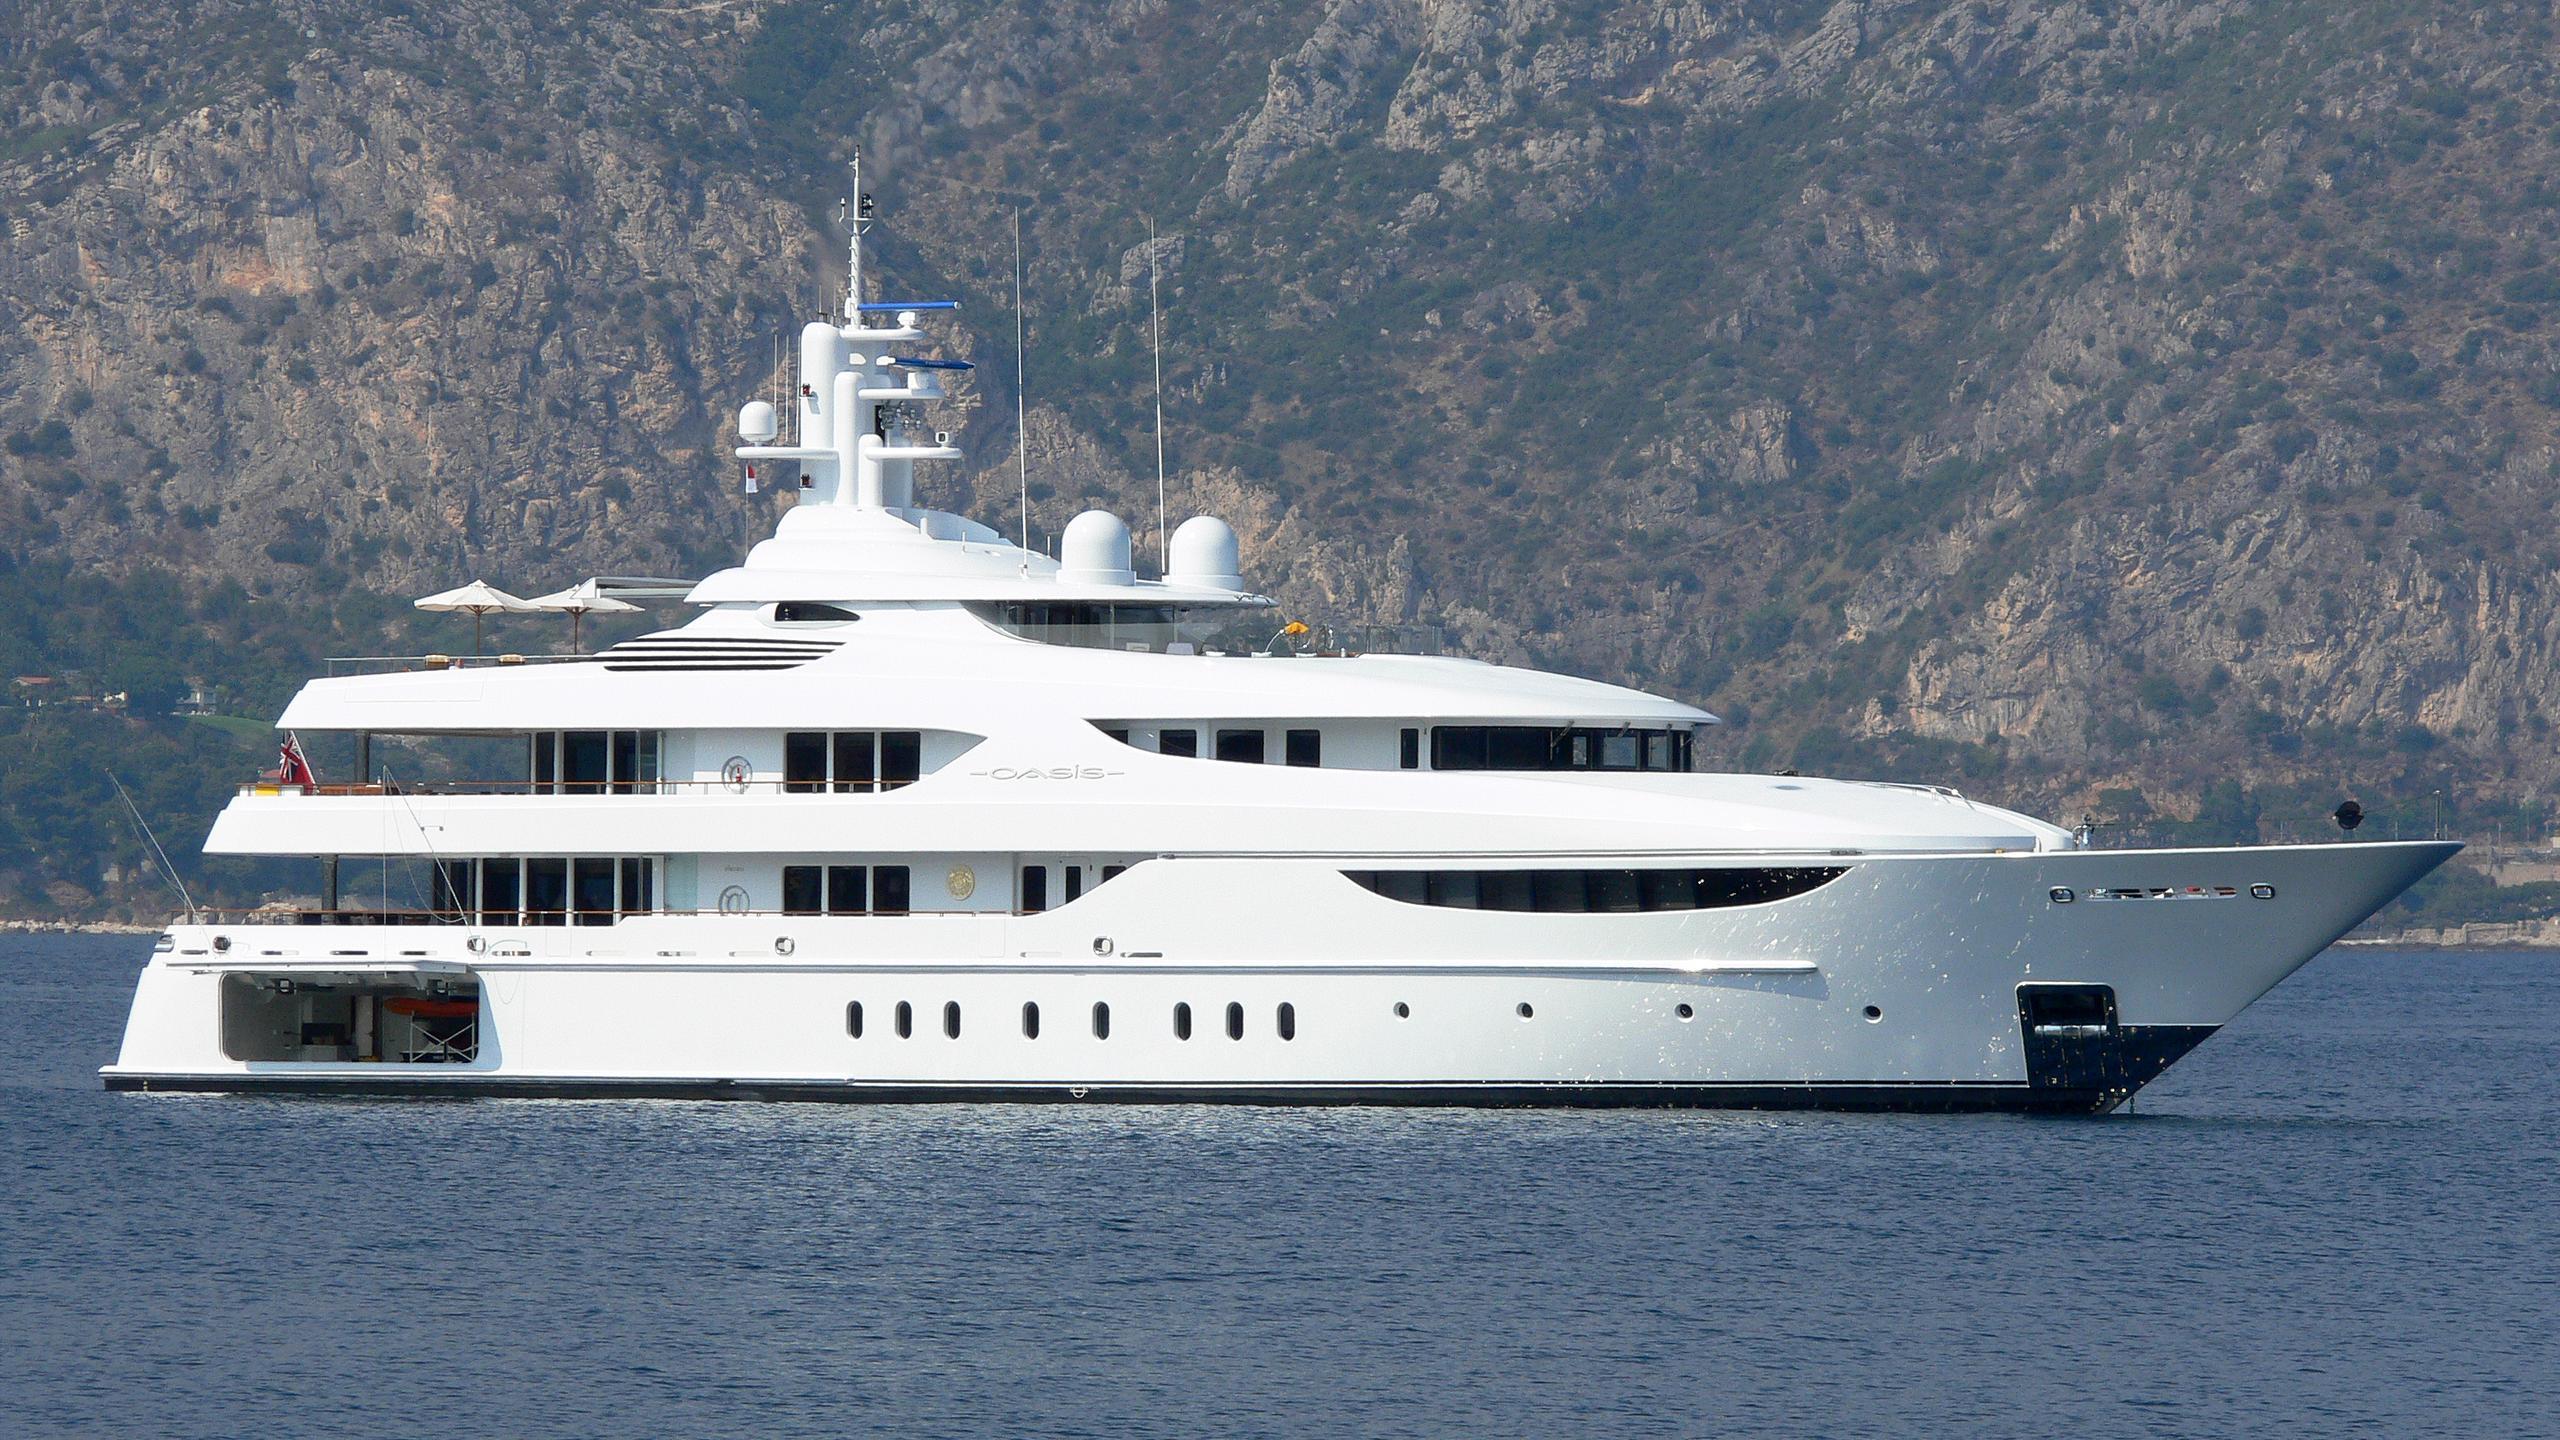 oasis-motor-yacht-lurssen-2006-60m-profile